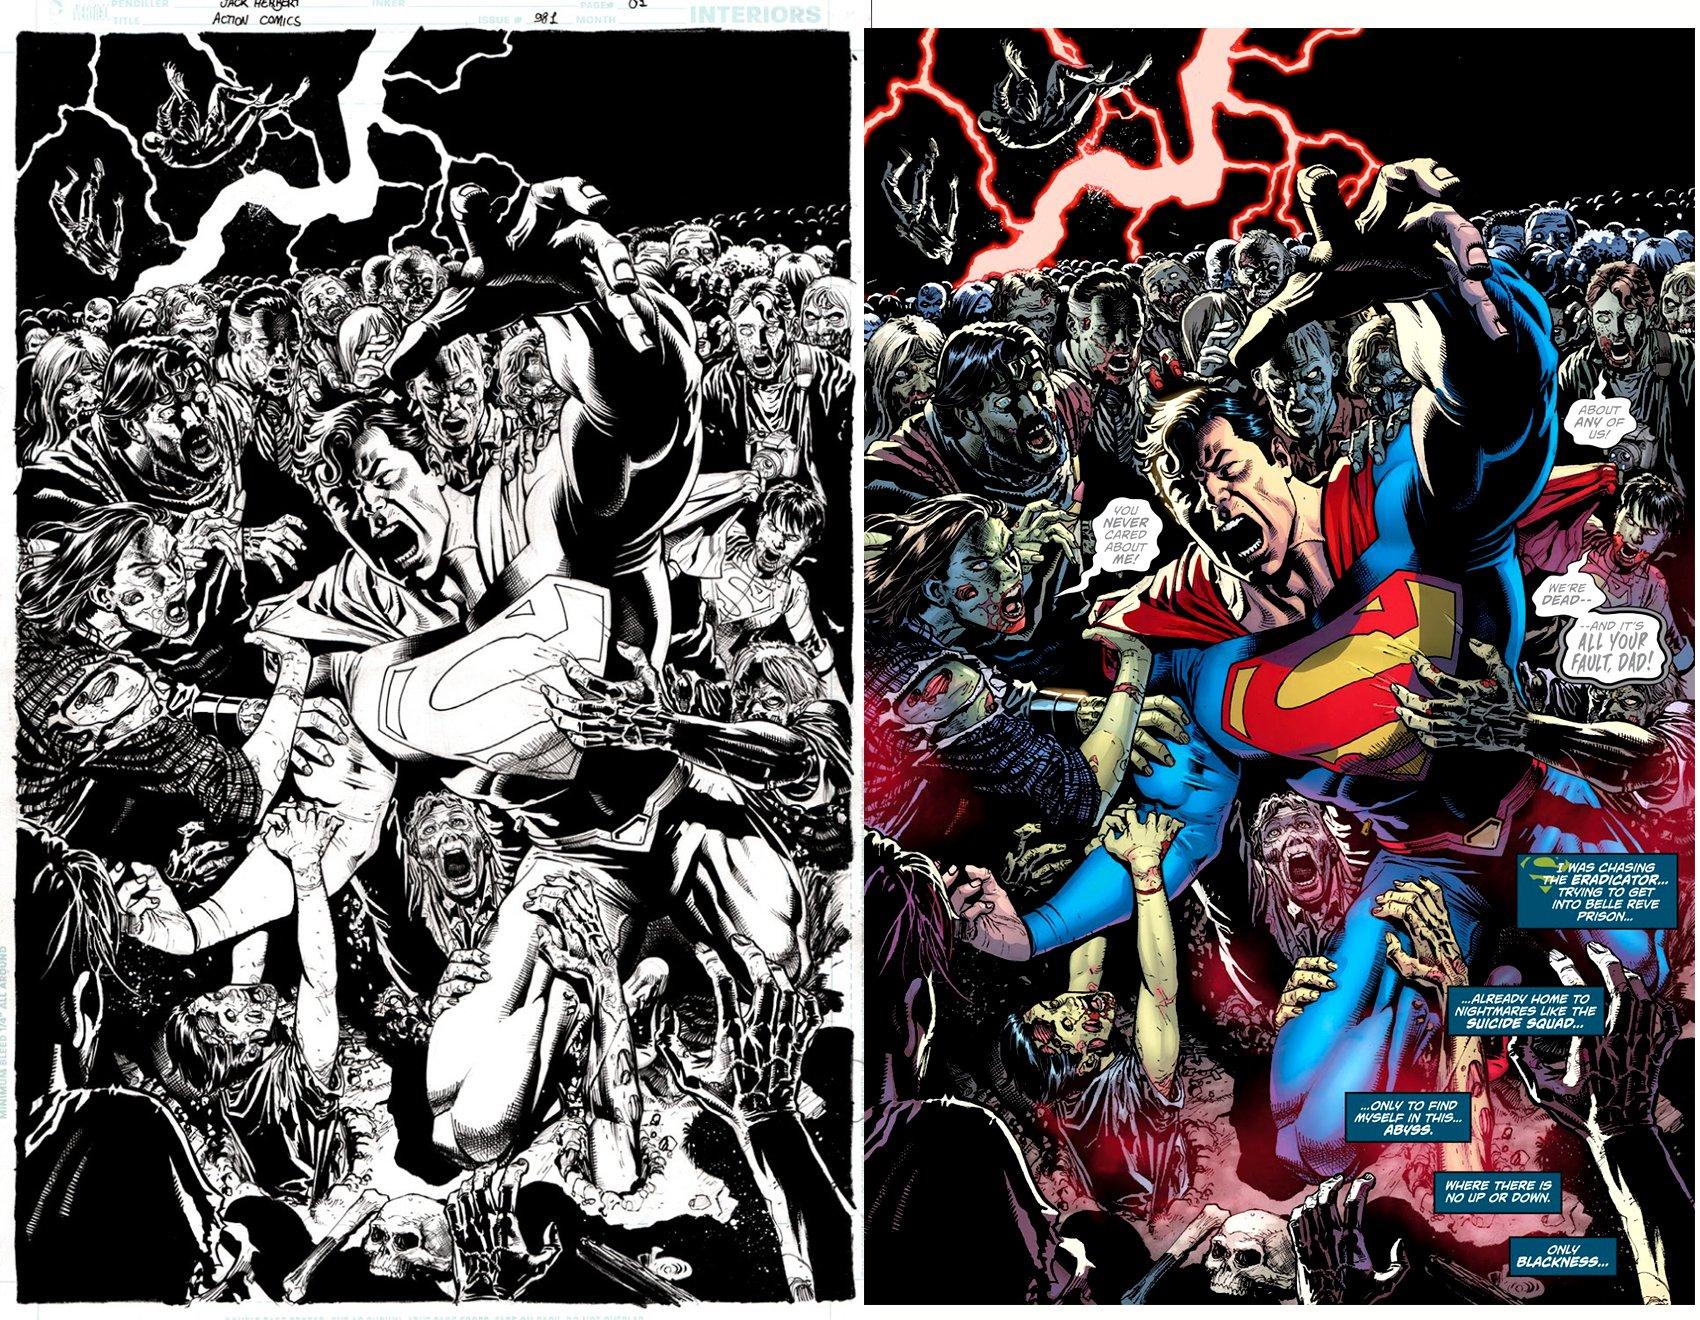 Action Comics #981 p 1 SPLASH